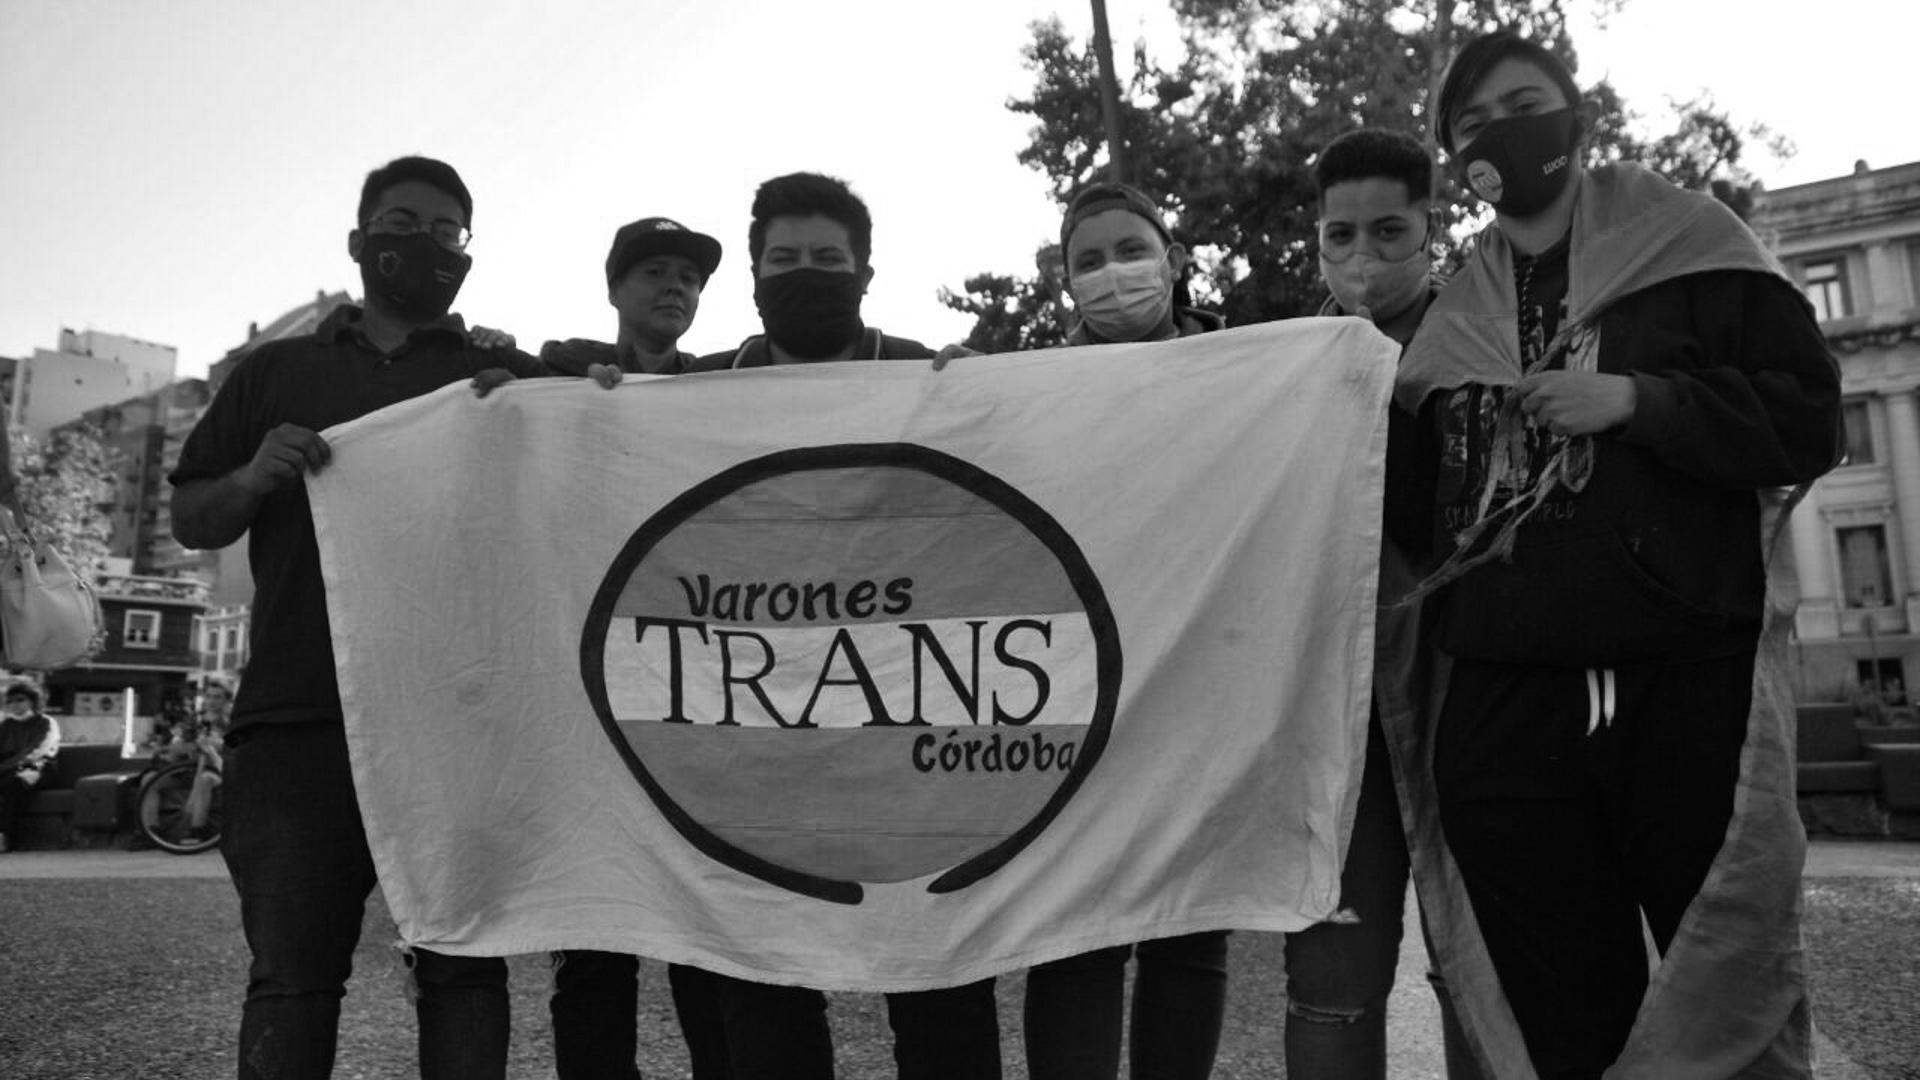 Banderazo-memoria-trans-córdoba-5